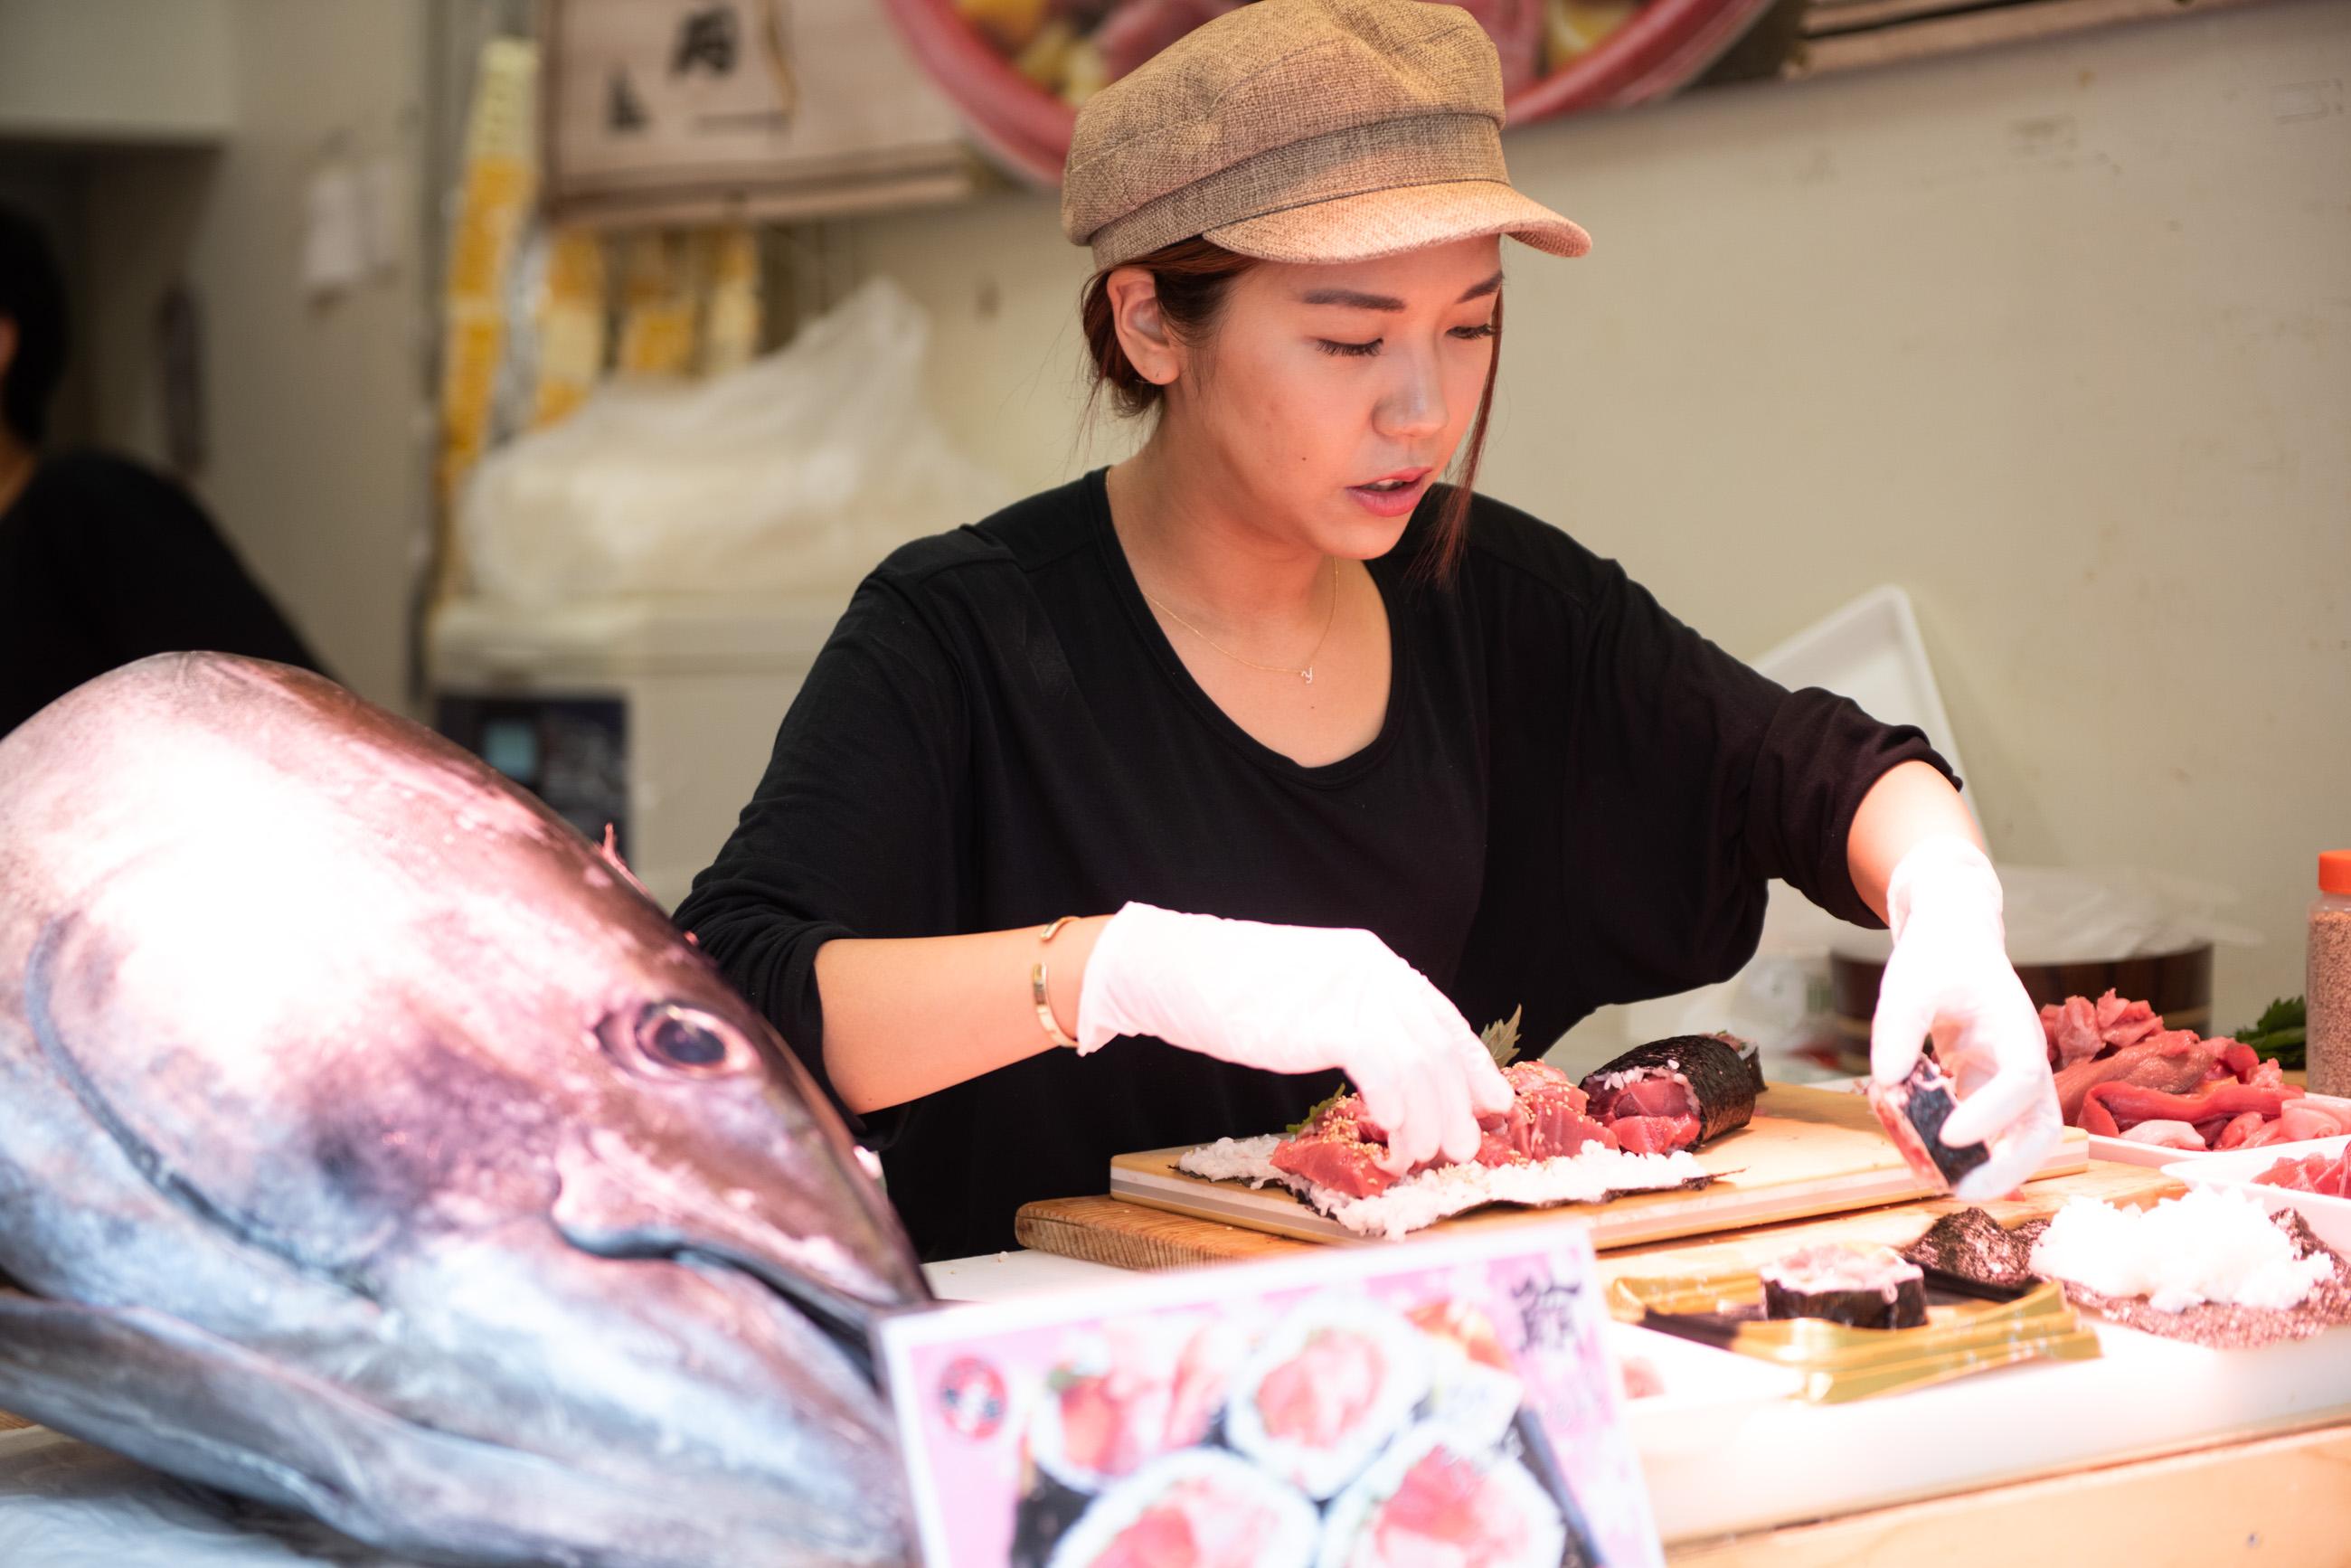 https://bubo.sk/uploads/galleries/4930/martinferencik_japonsko_tsukiji_dsc2806.jpg